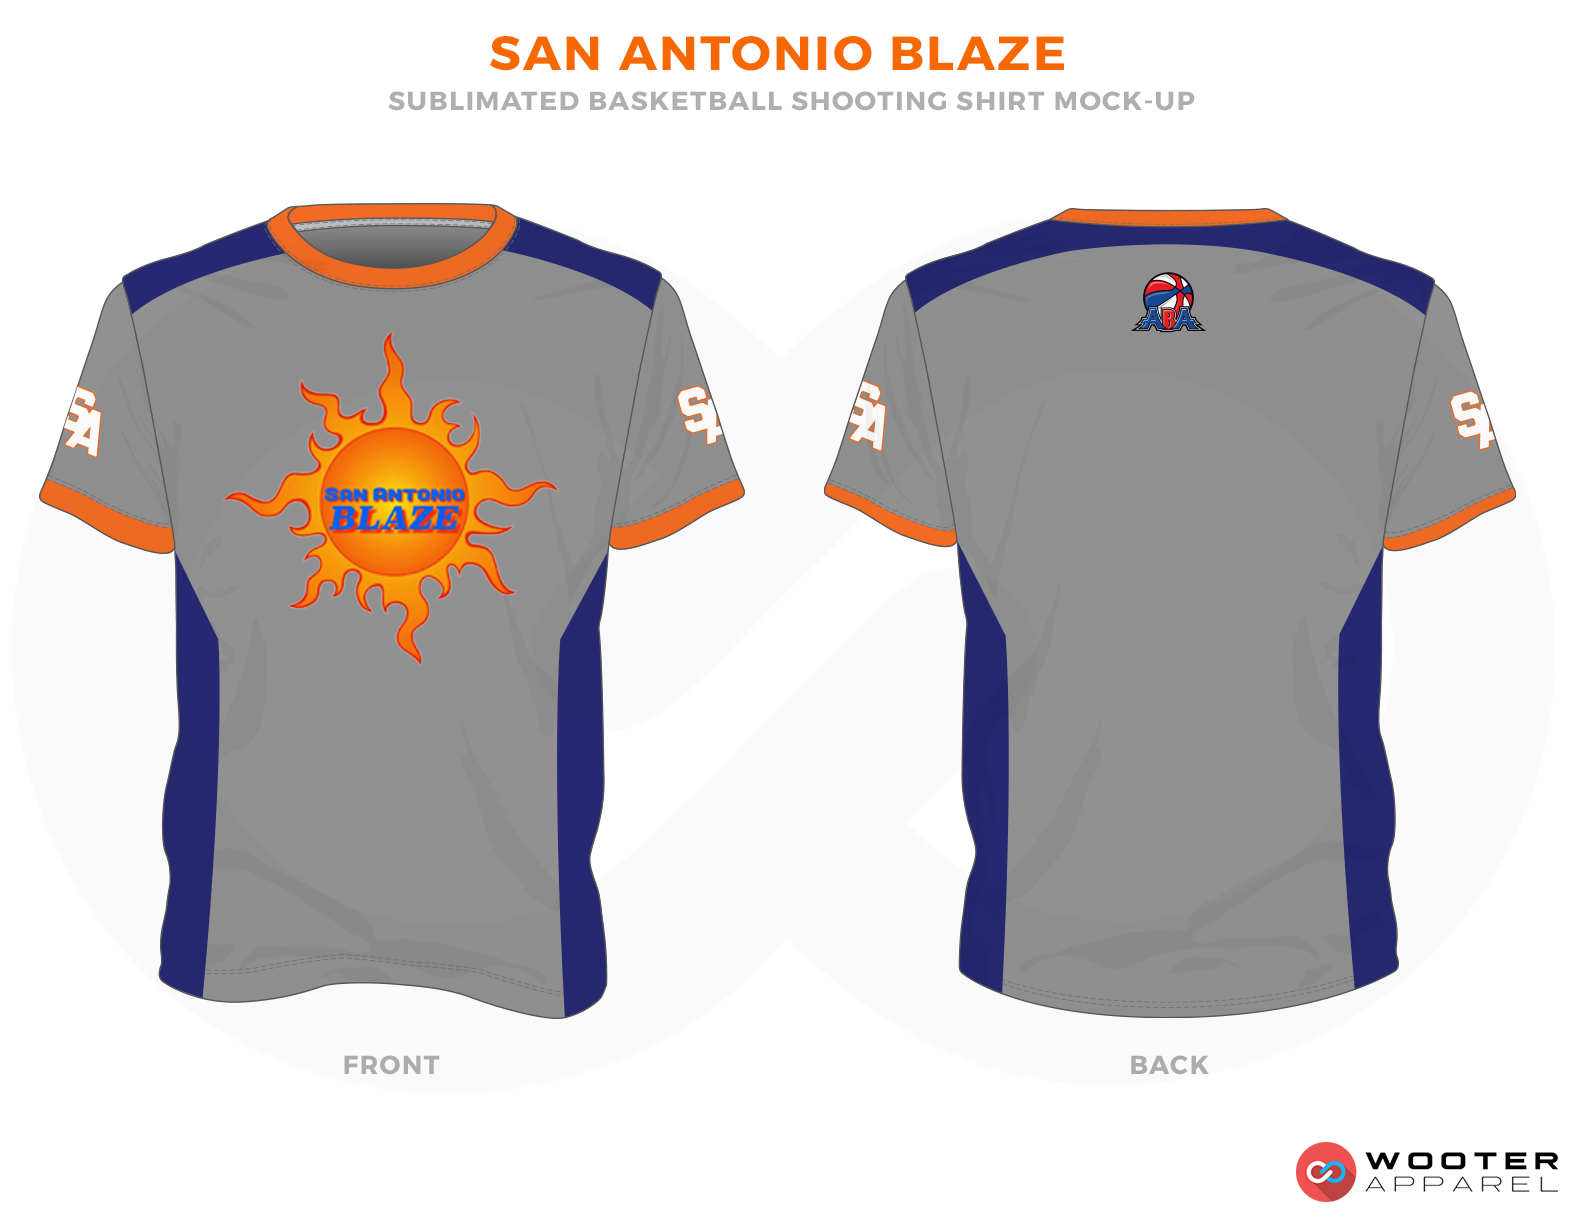 SAN ANTONIO BLAZE Grey Blue White and Oringe Basketball Uniforms,